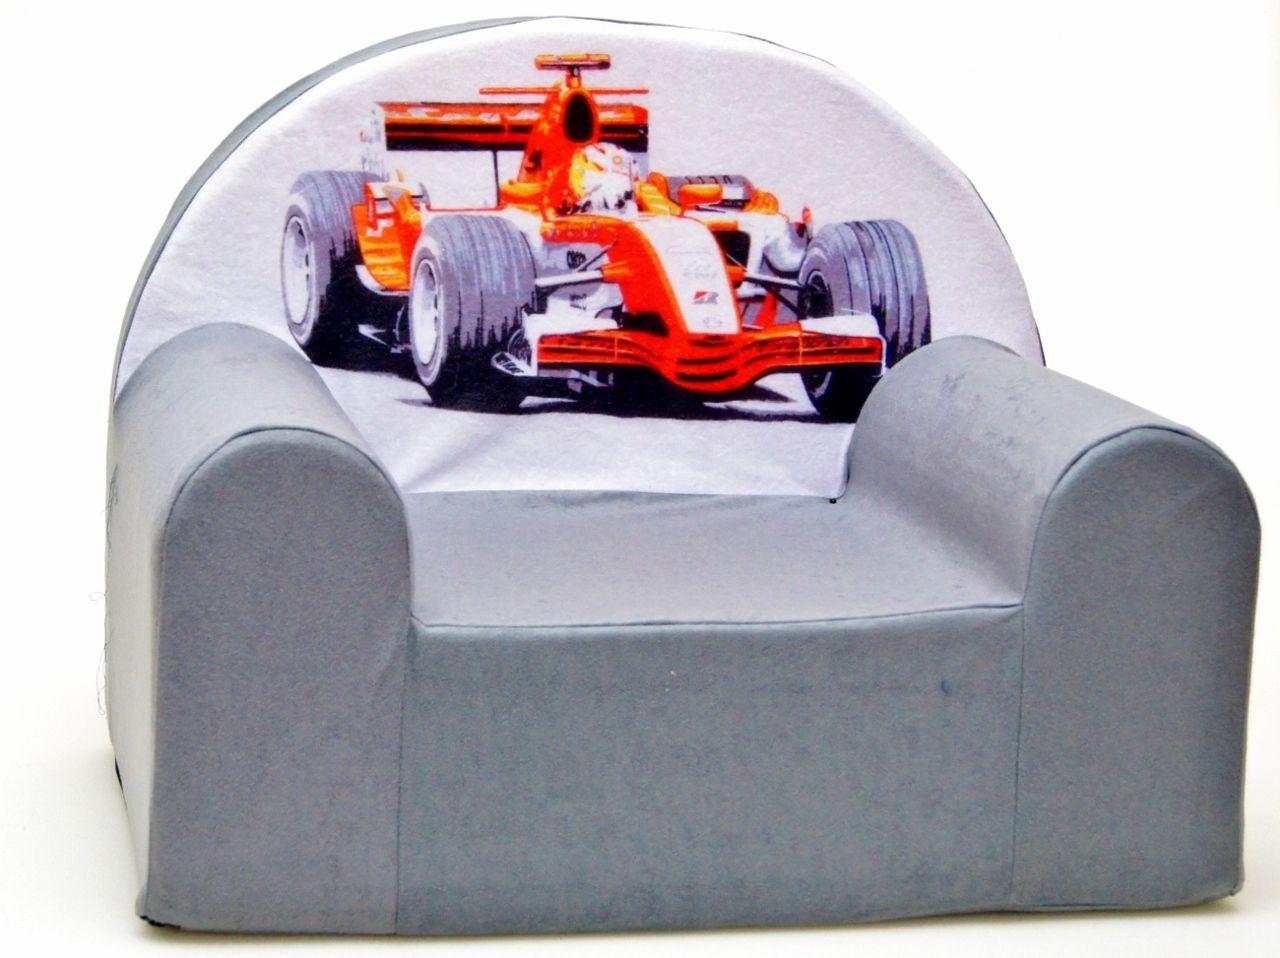 Children's Foam Armchair type W wfa22